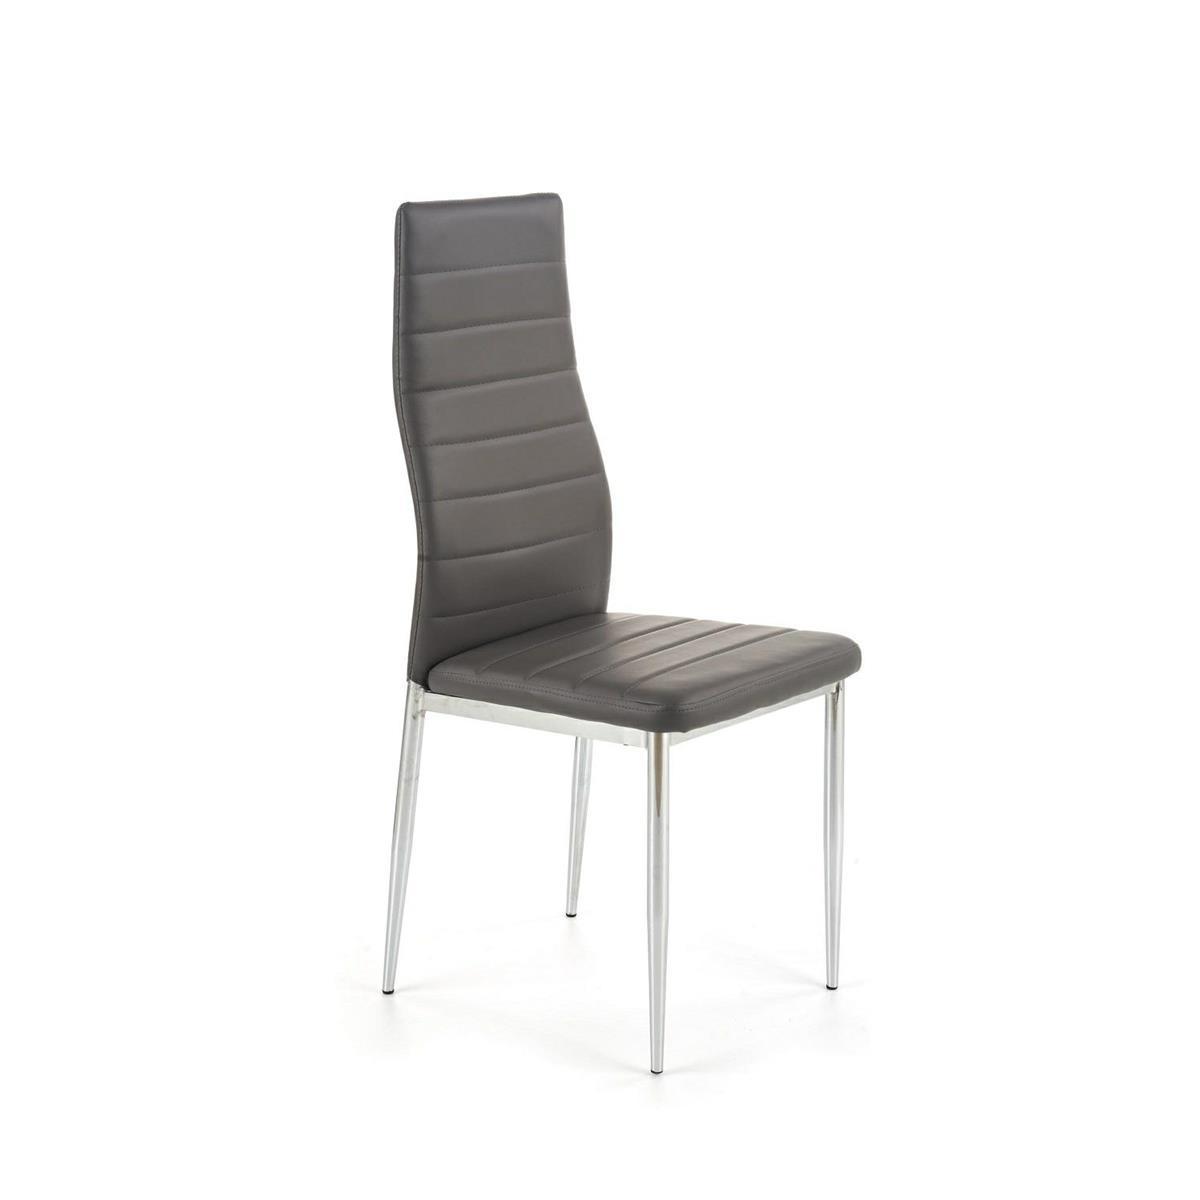 Krzesło model K70C popielate